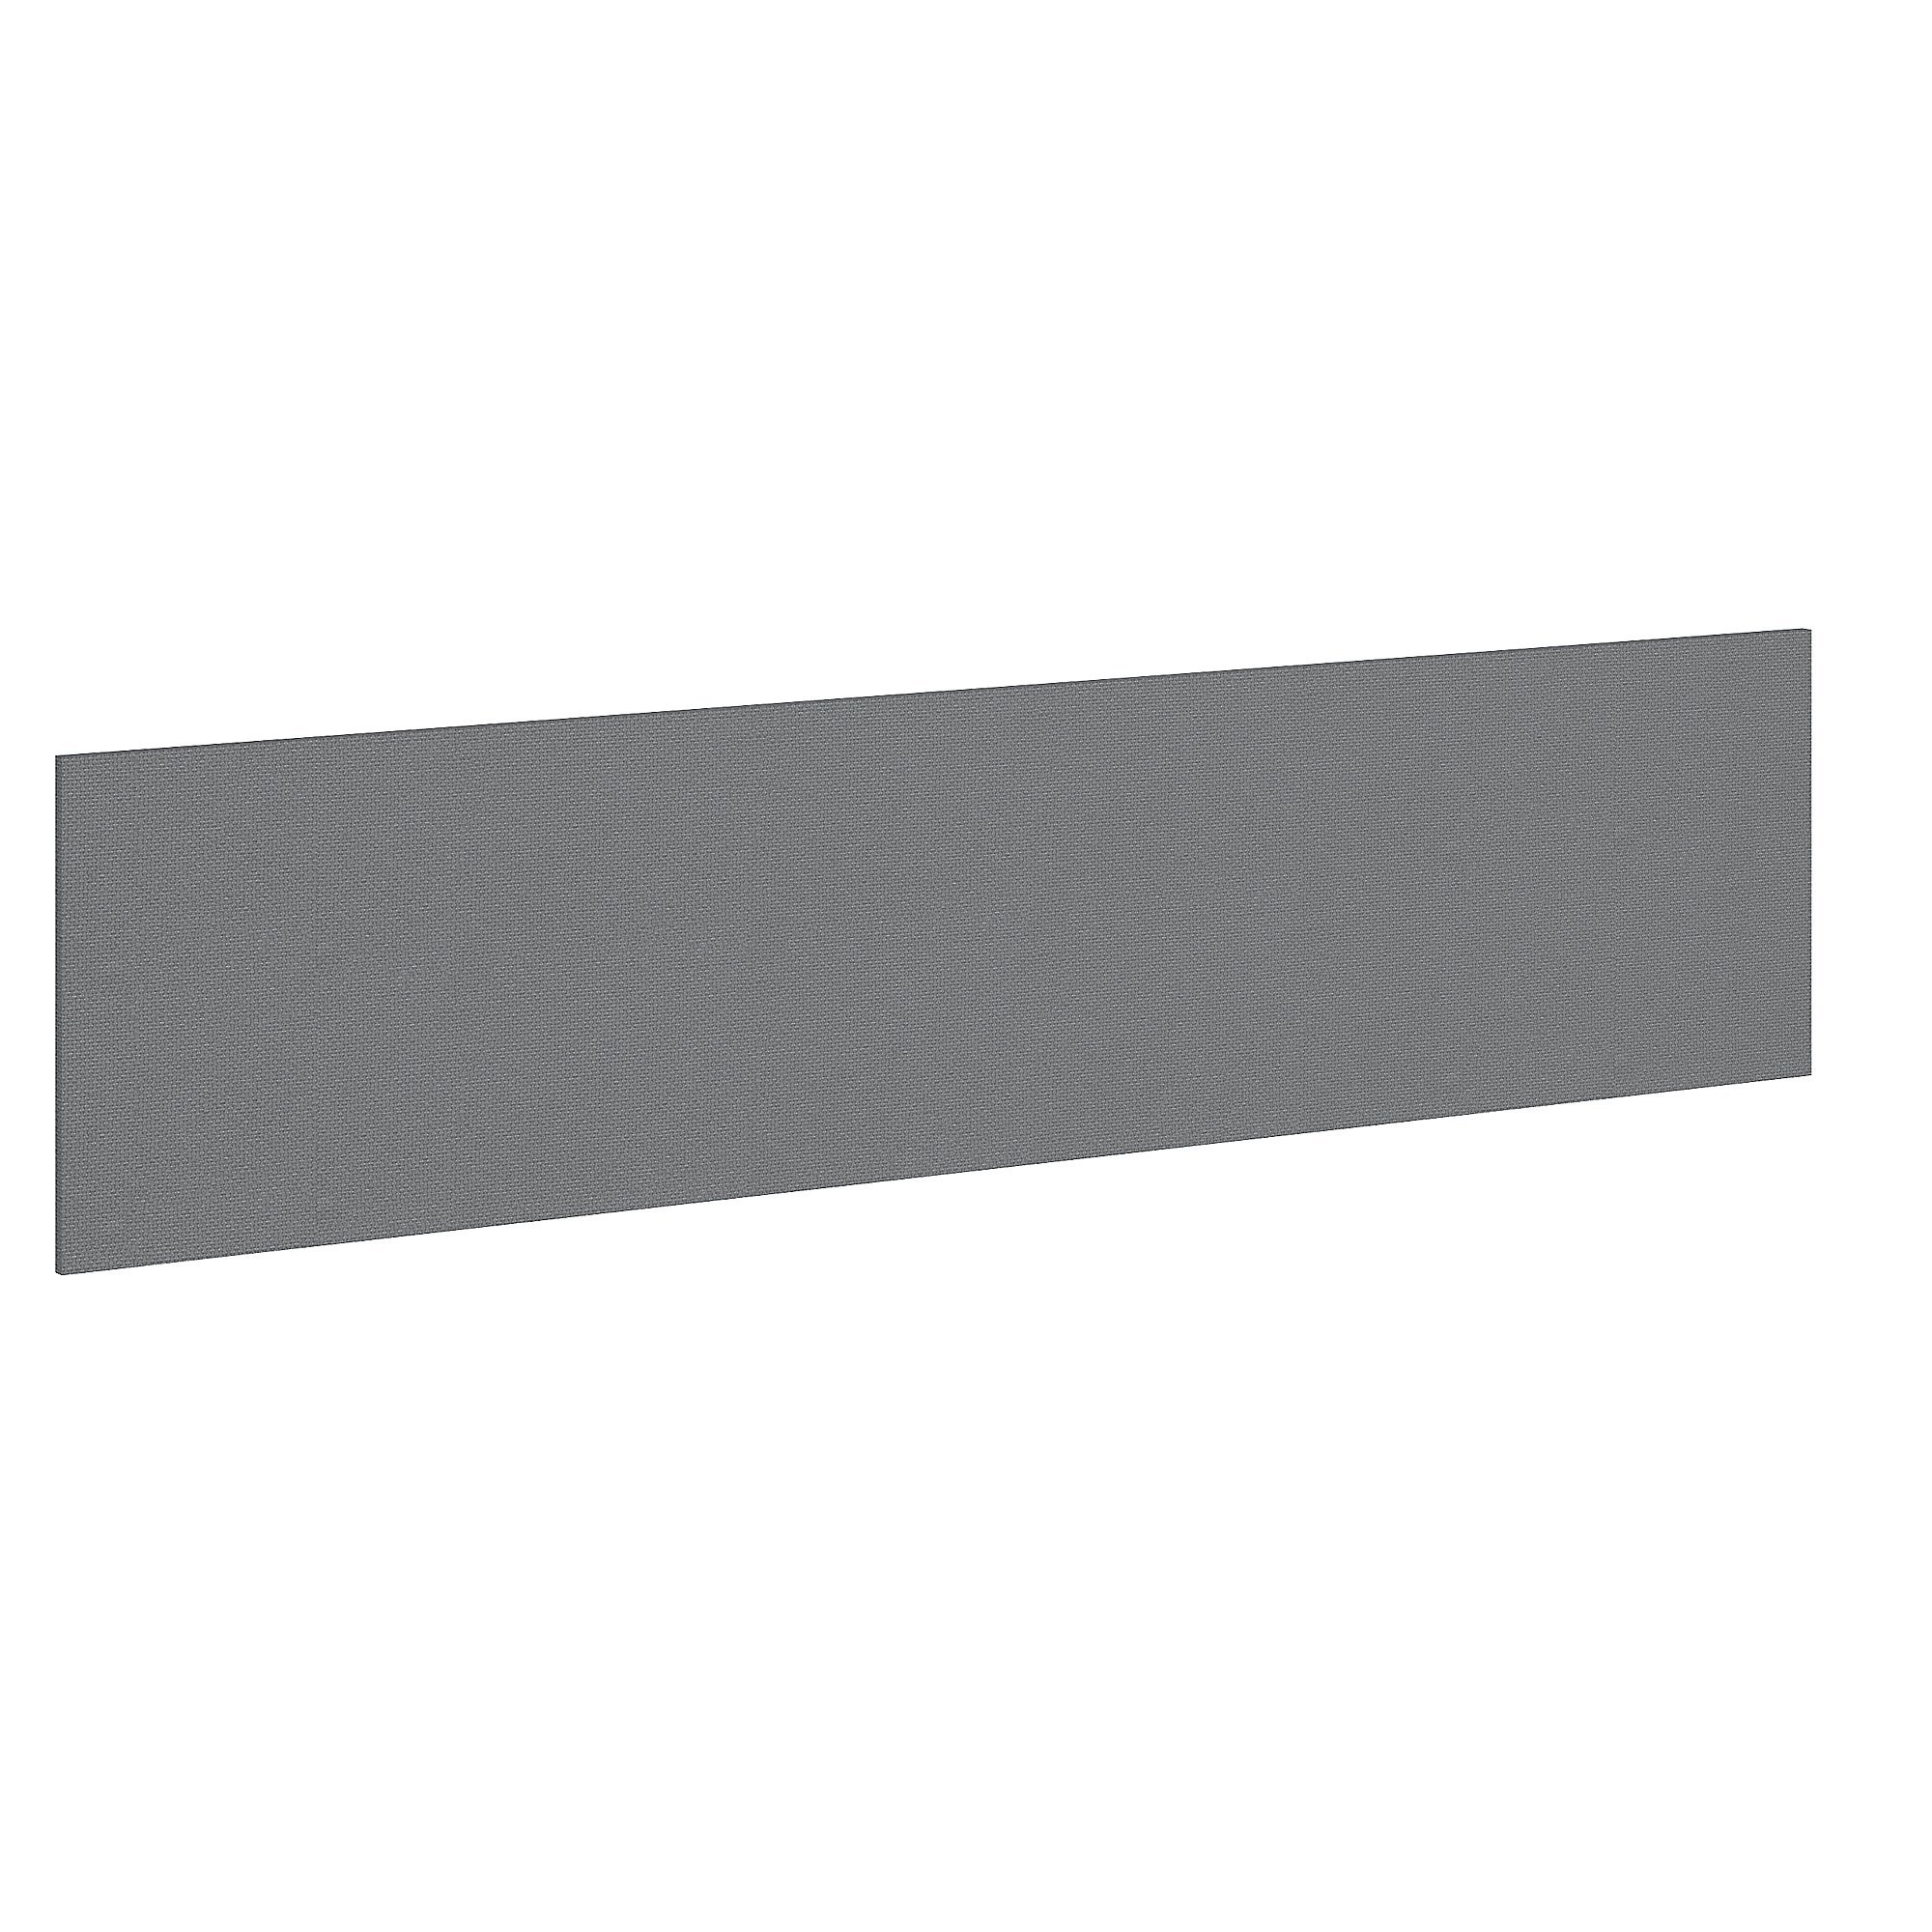 Bush Business Furniture Studio C 72W Tack Board in Smoke